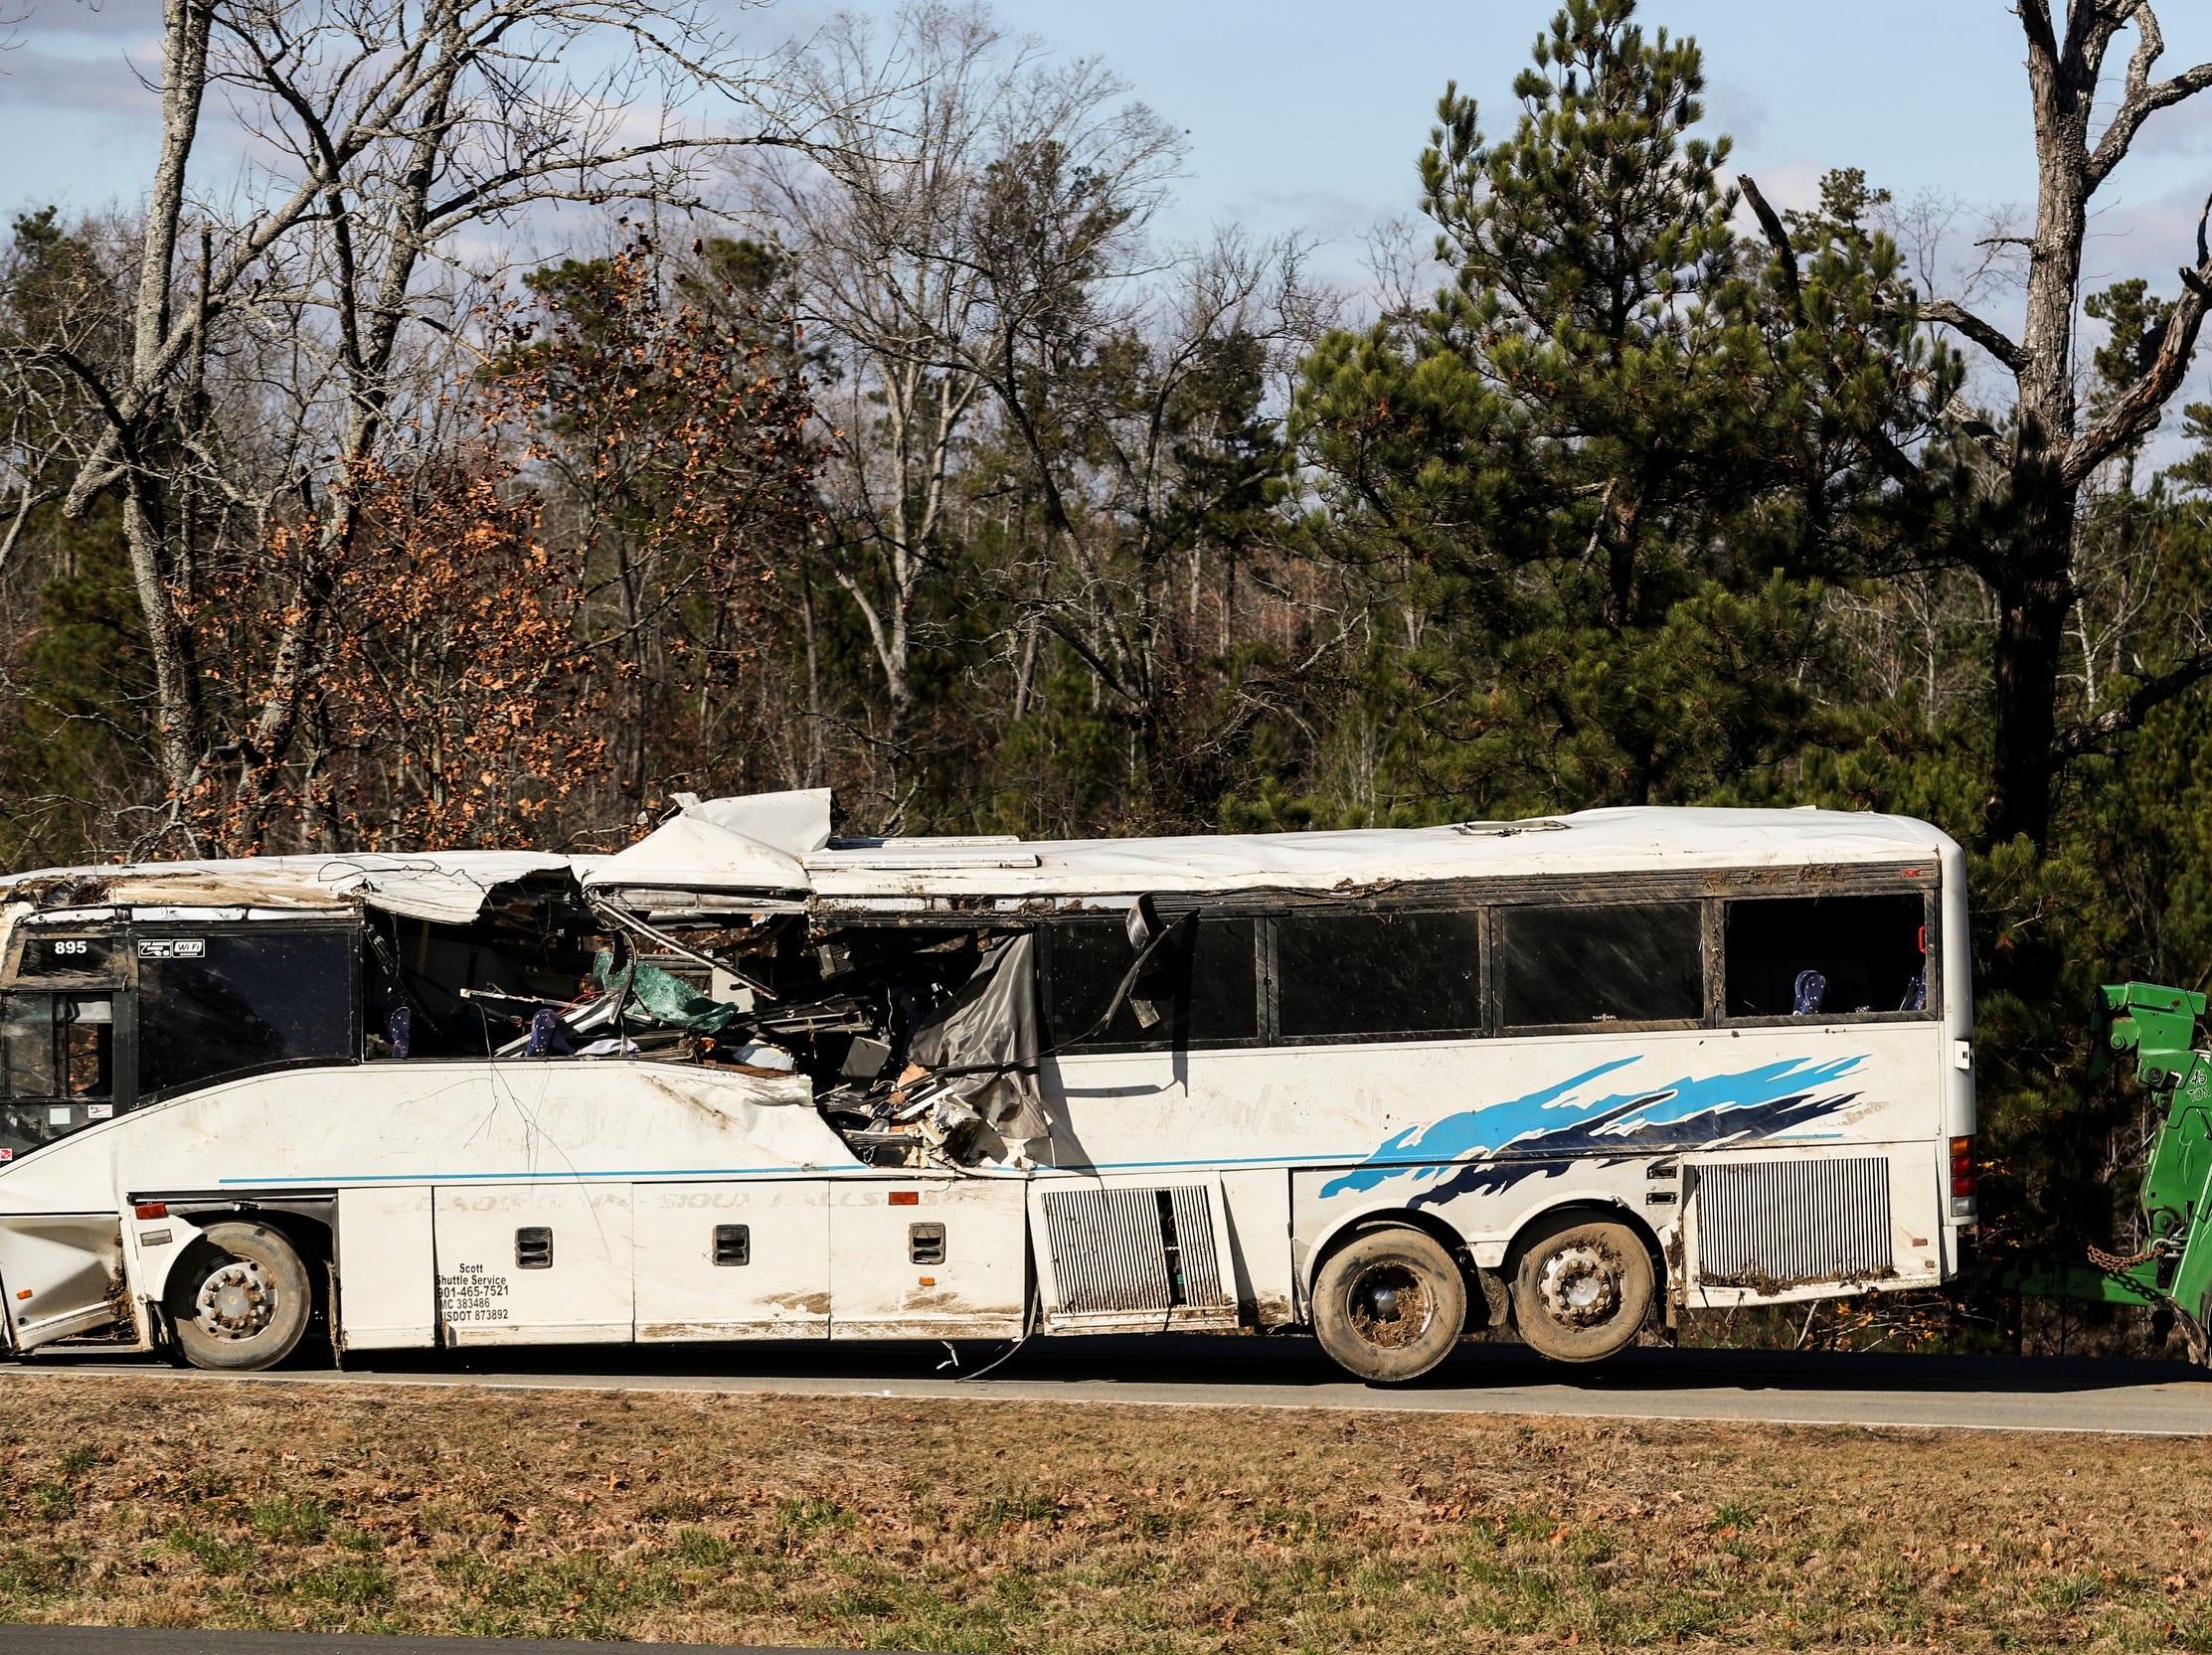 Arkansas bus crash: Funeral, visitation for Memphis 9-year-old scheduled